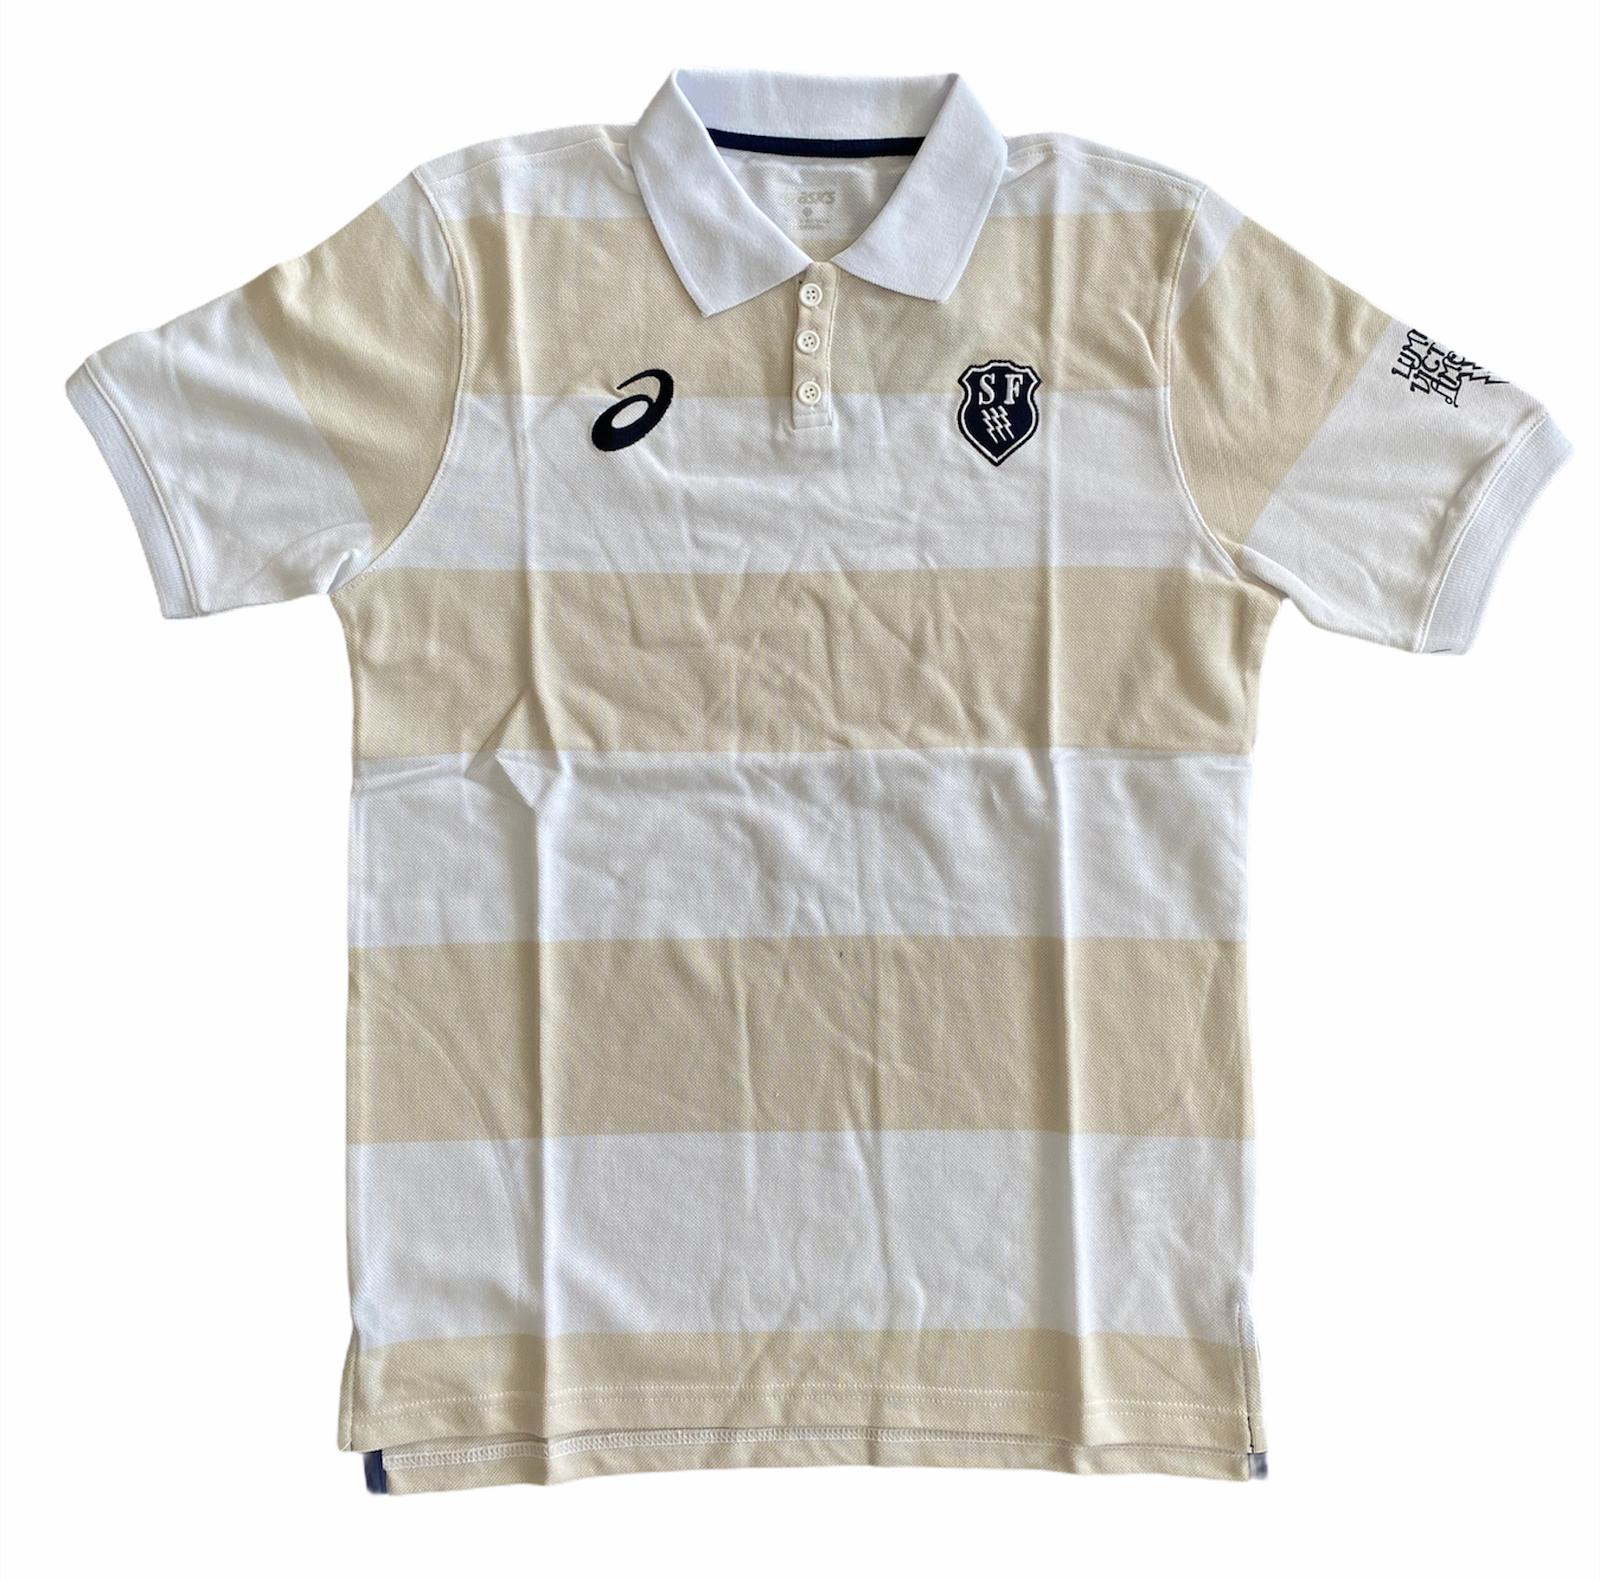 Stade Francais Mens Polo Asics Short-Sleeved Rugby Polo Shirt - New